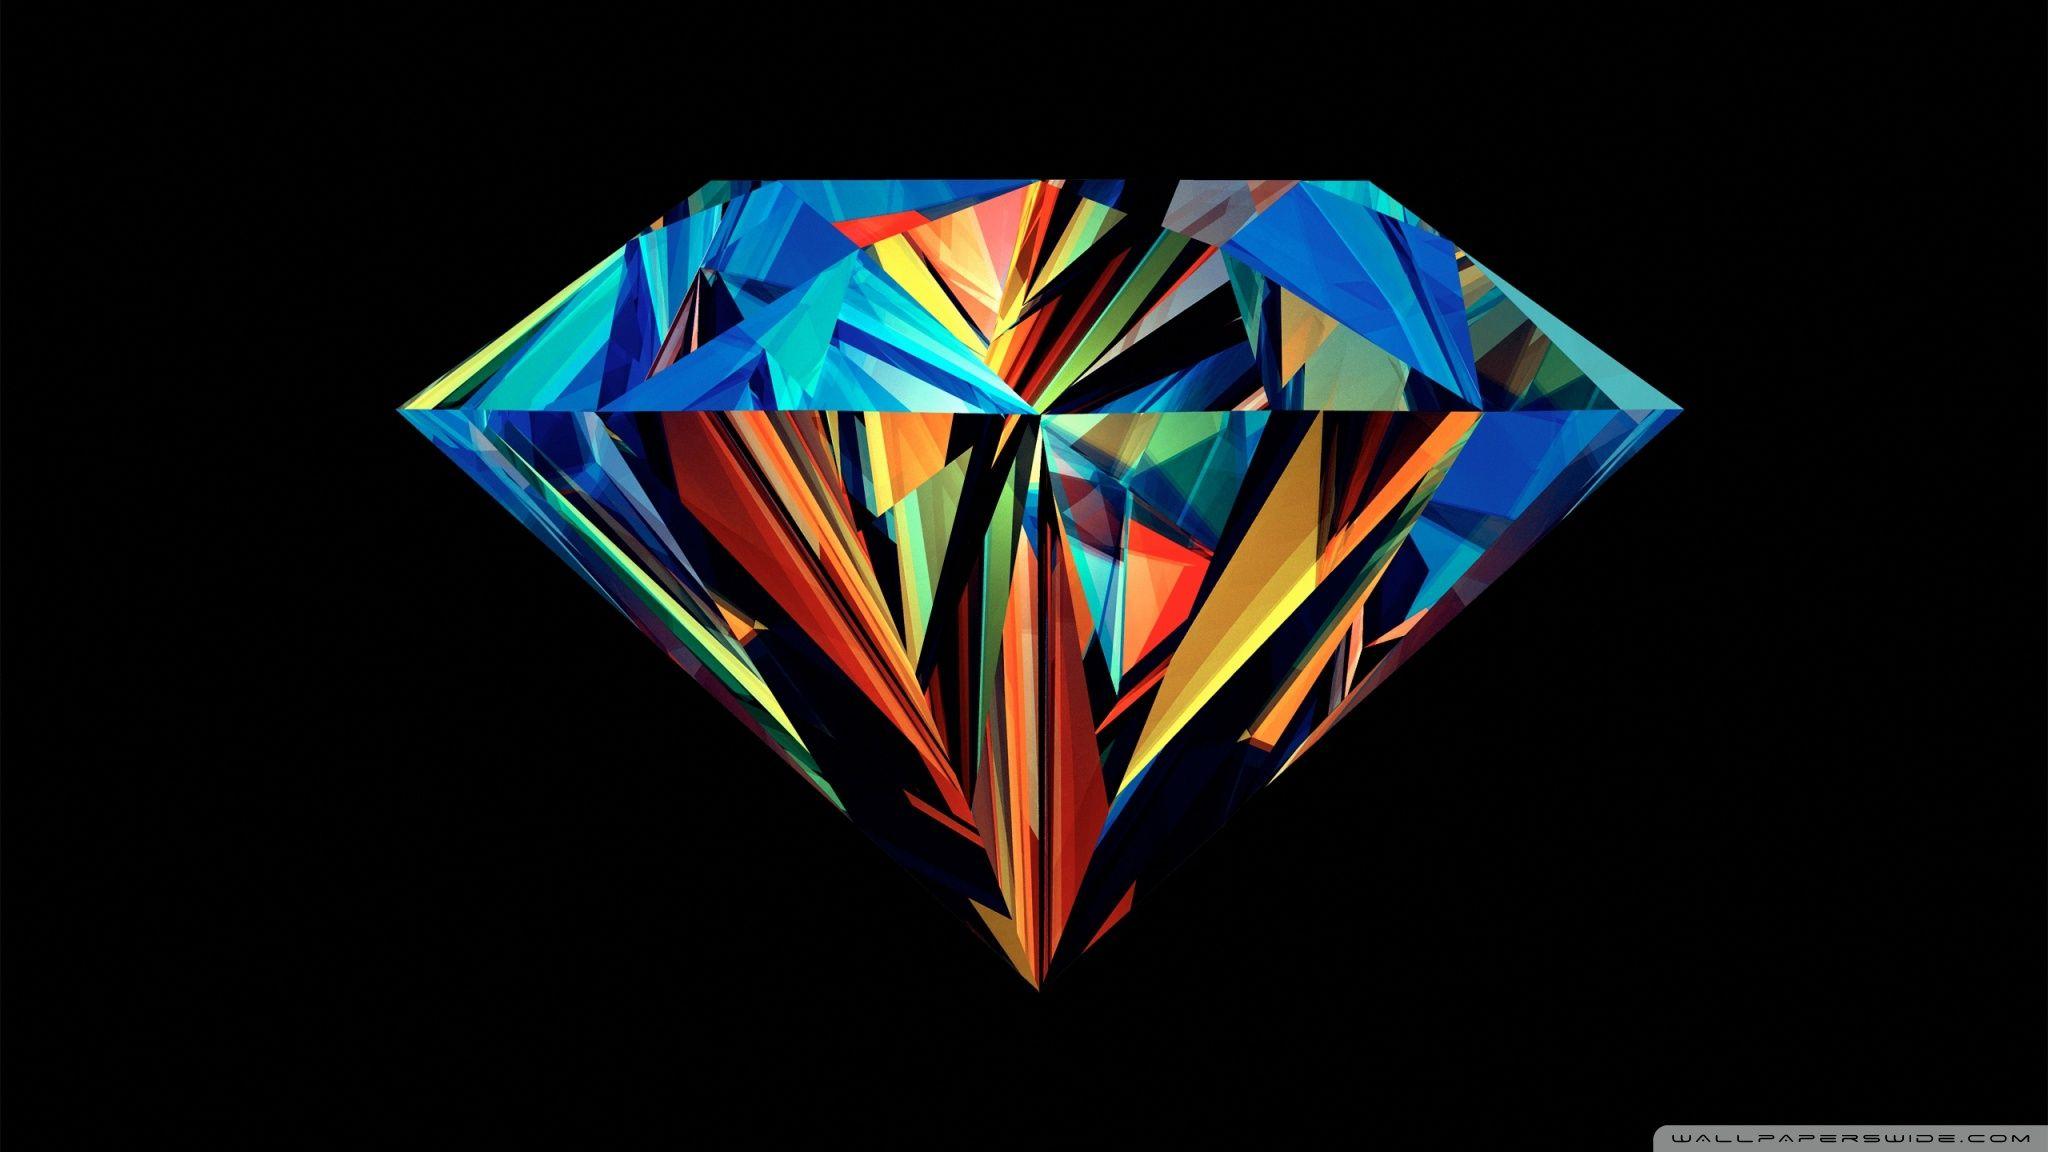 Diamond-wallpaper-9.jpg (2048×1152)